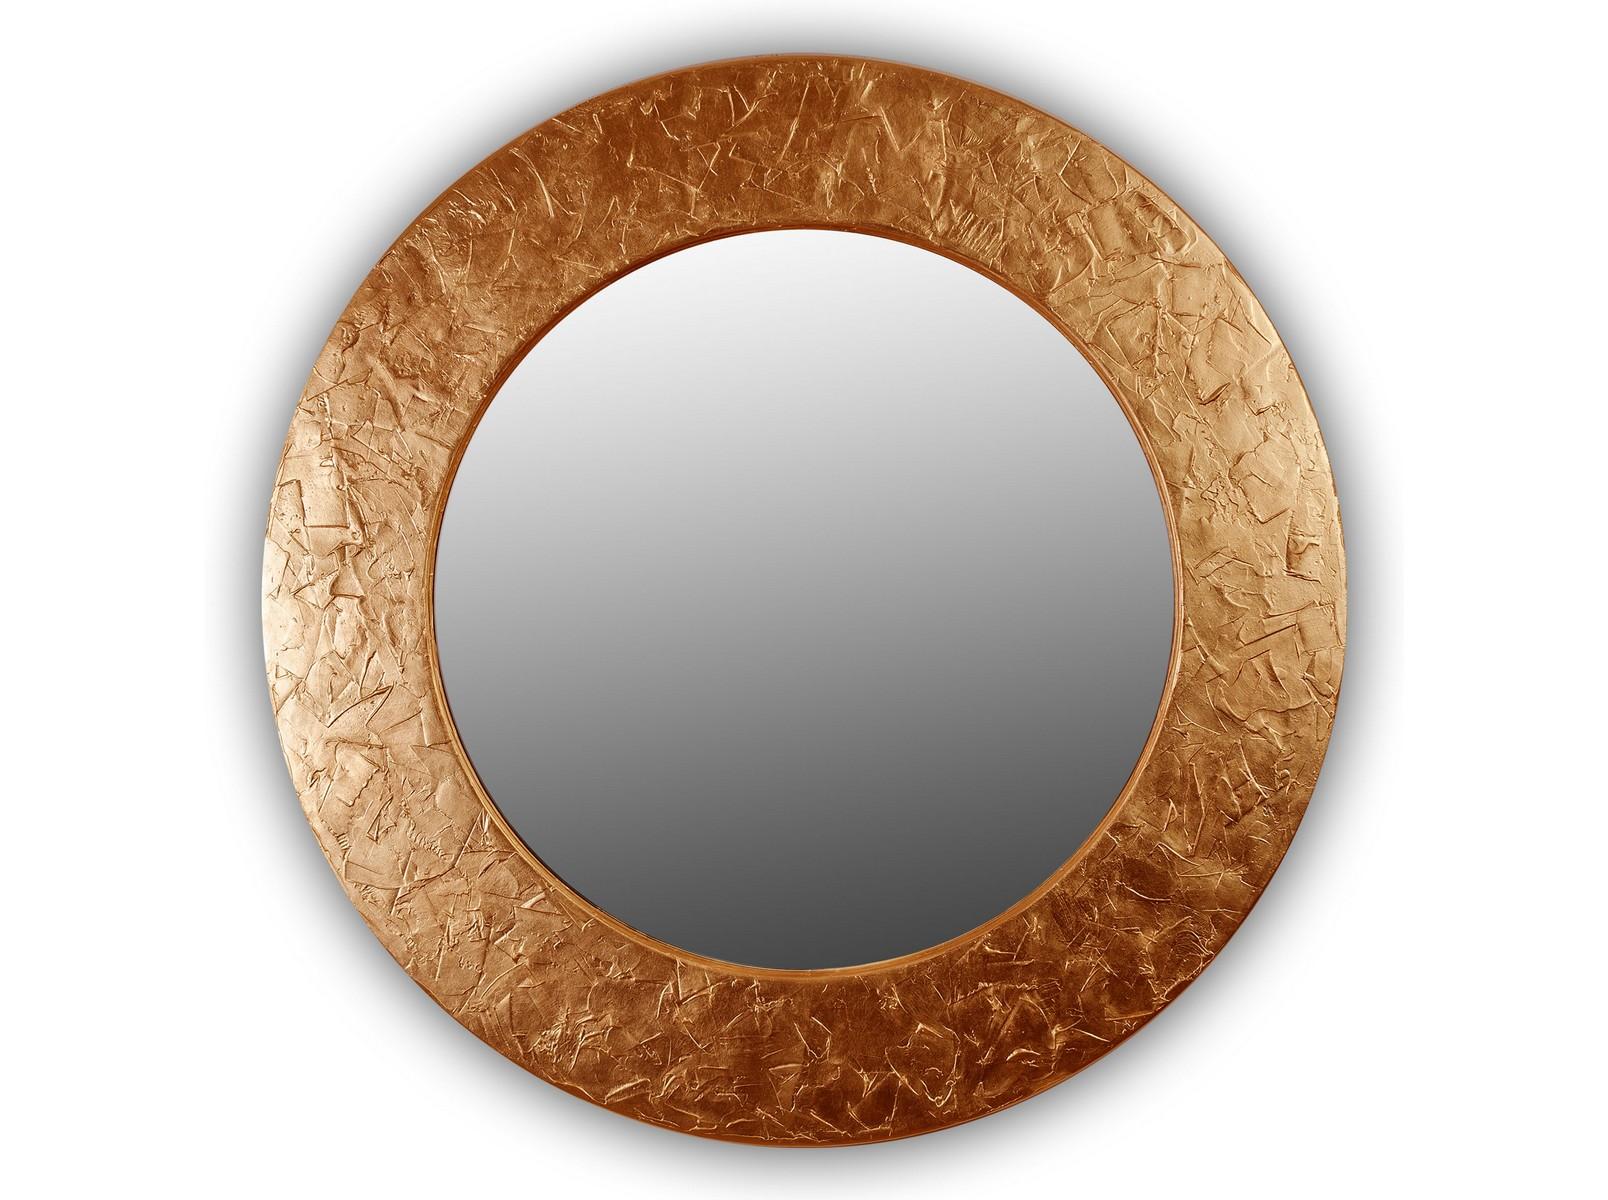 Зеркало FASHION STROKESНастенные зеркала<br>Данный вариант представлен в бронзовом цвете.<br><br>Material: Дерево<br>Глубина см: 4